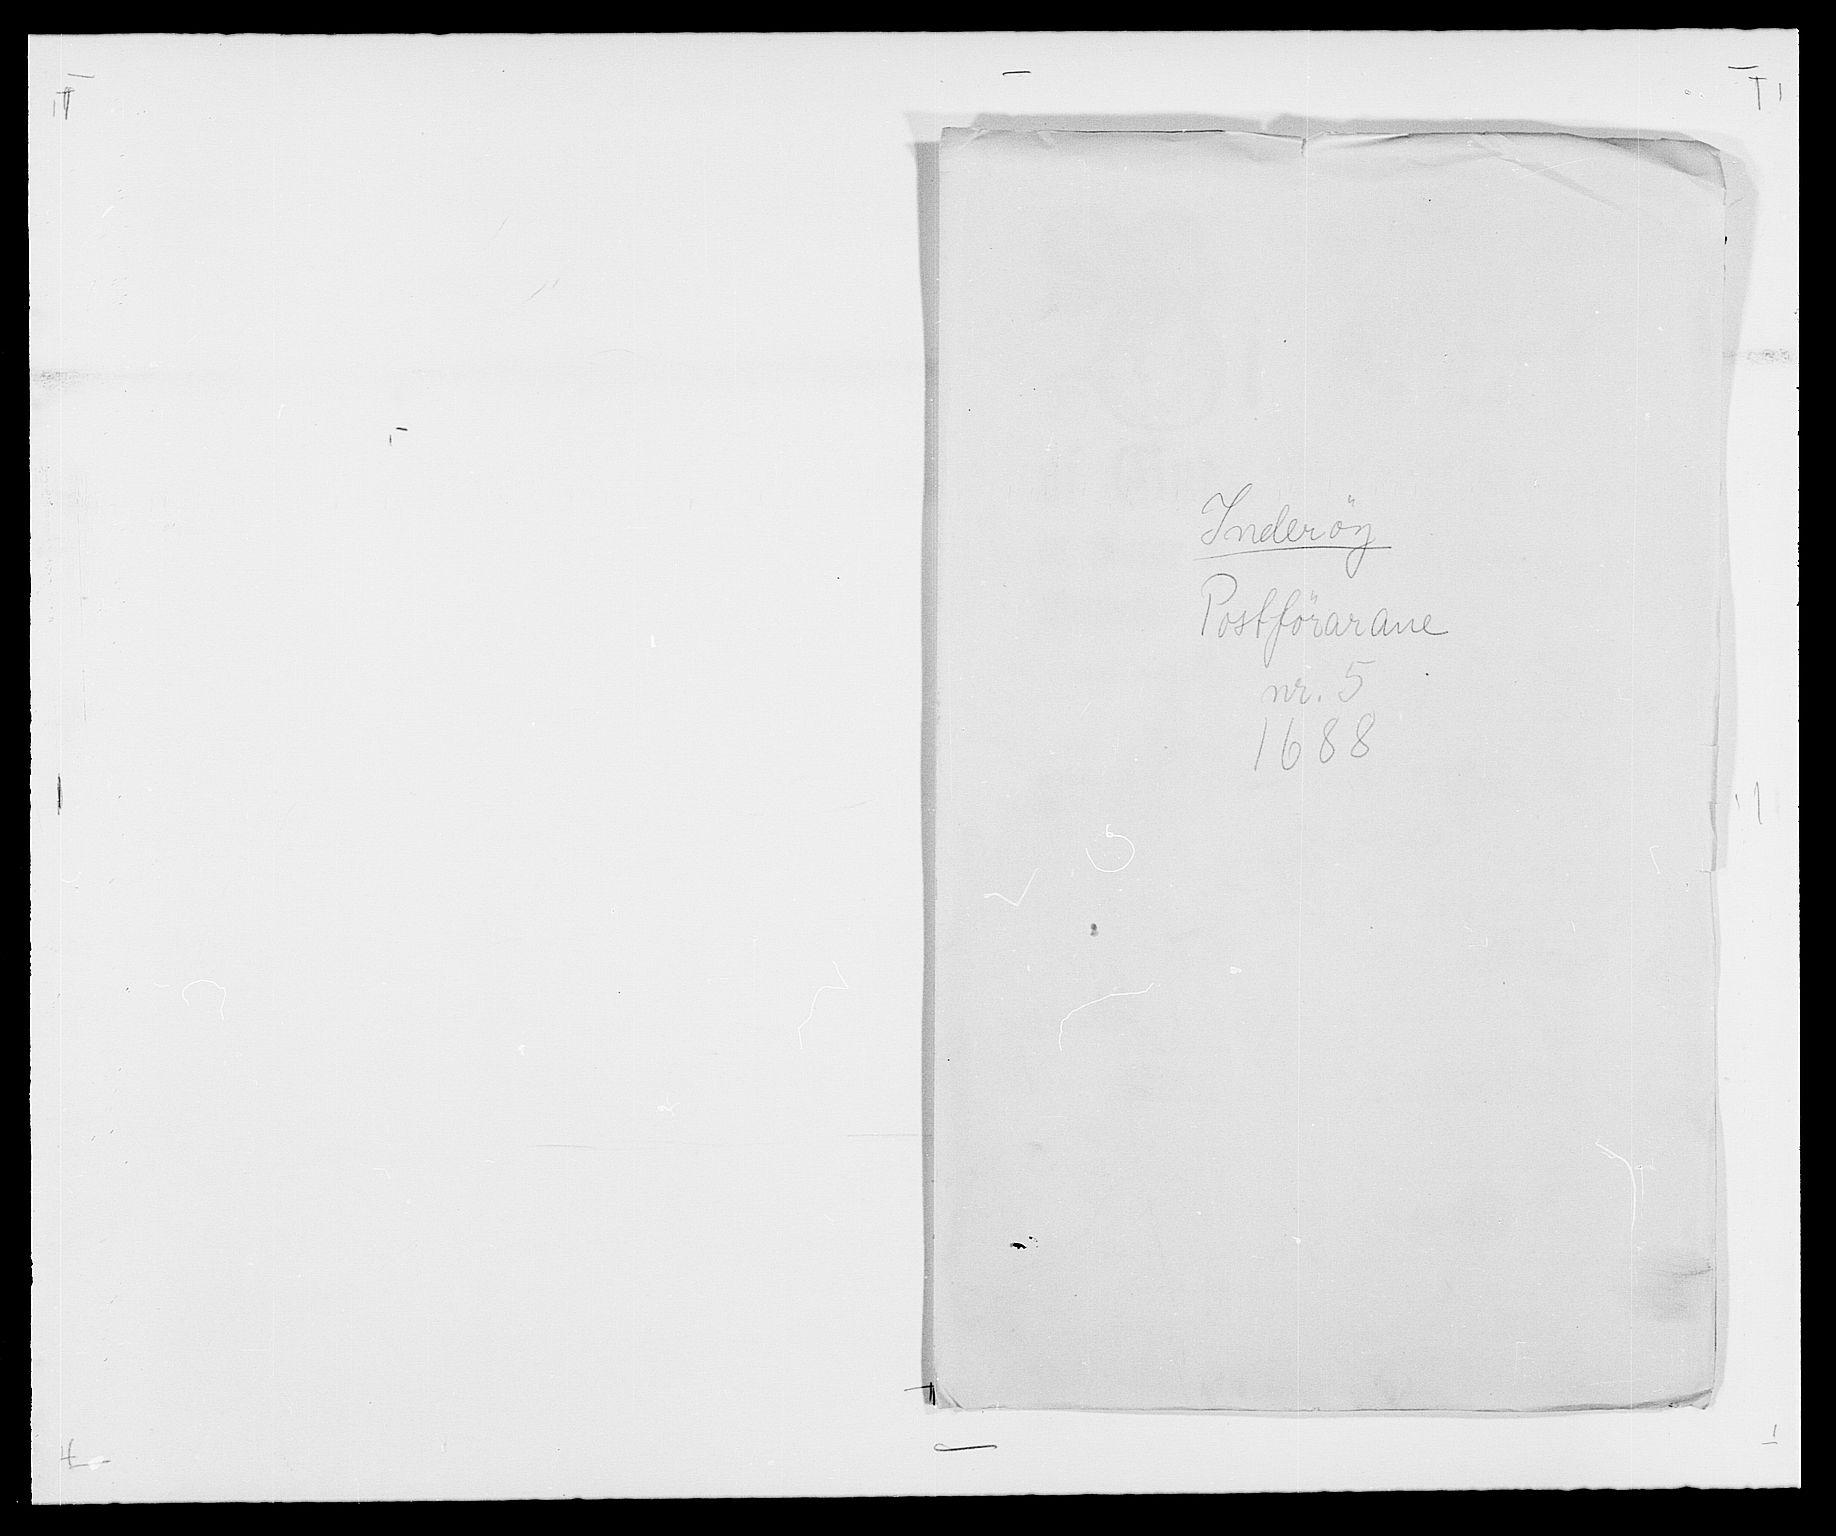 RA, Rentekammeret inntil 1814, Reviderte regnskaper, Fogderegnskap, R63/L4306: Fogderegnskap Inderøy, 1687-1689, s. 381